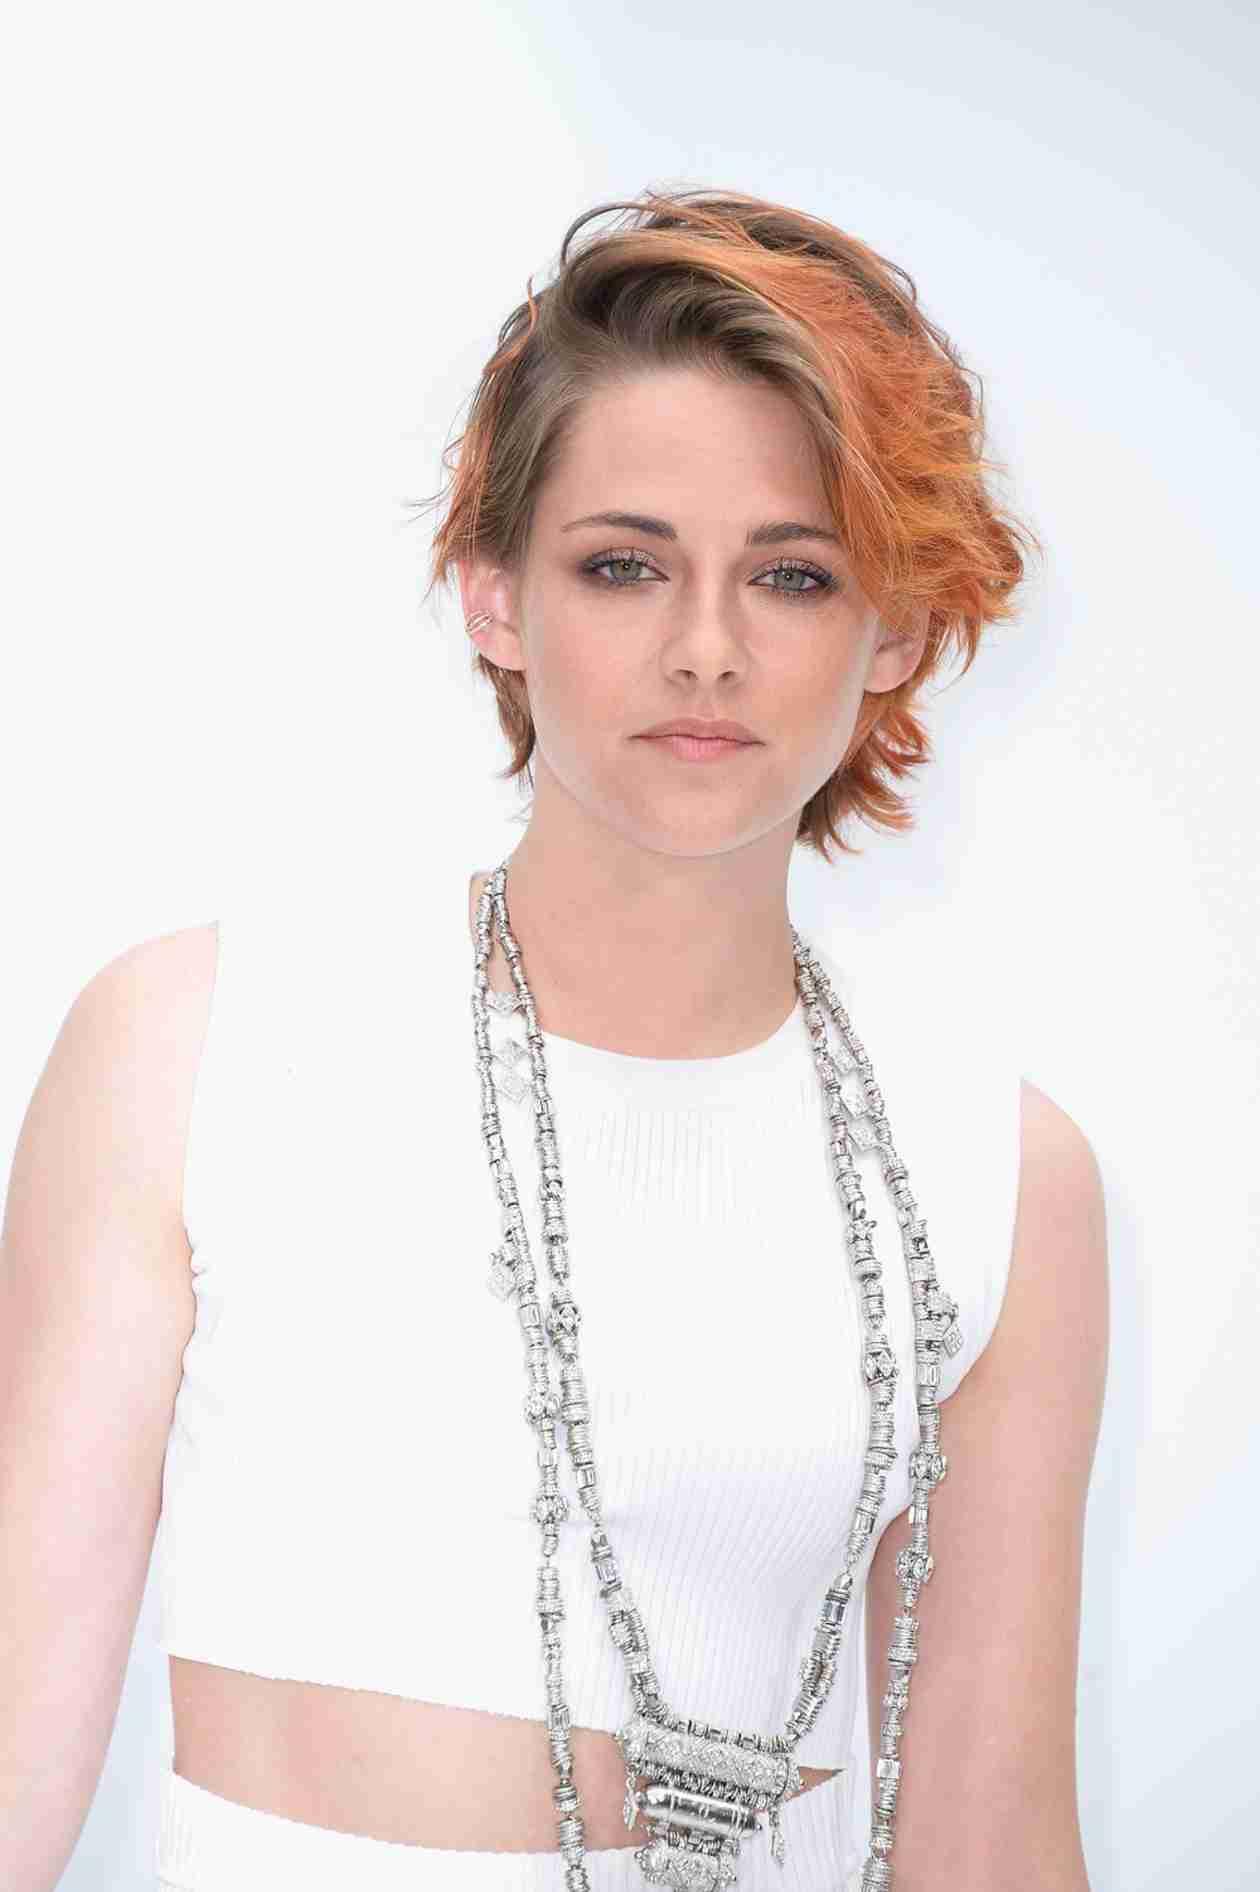 Kristen Stewart Goes Back to Brown Hair, Bids Farewell to Orange Hue (PHOTOS)